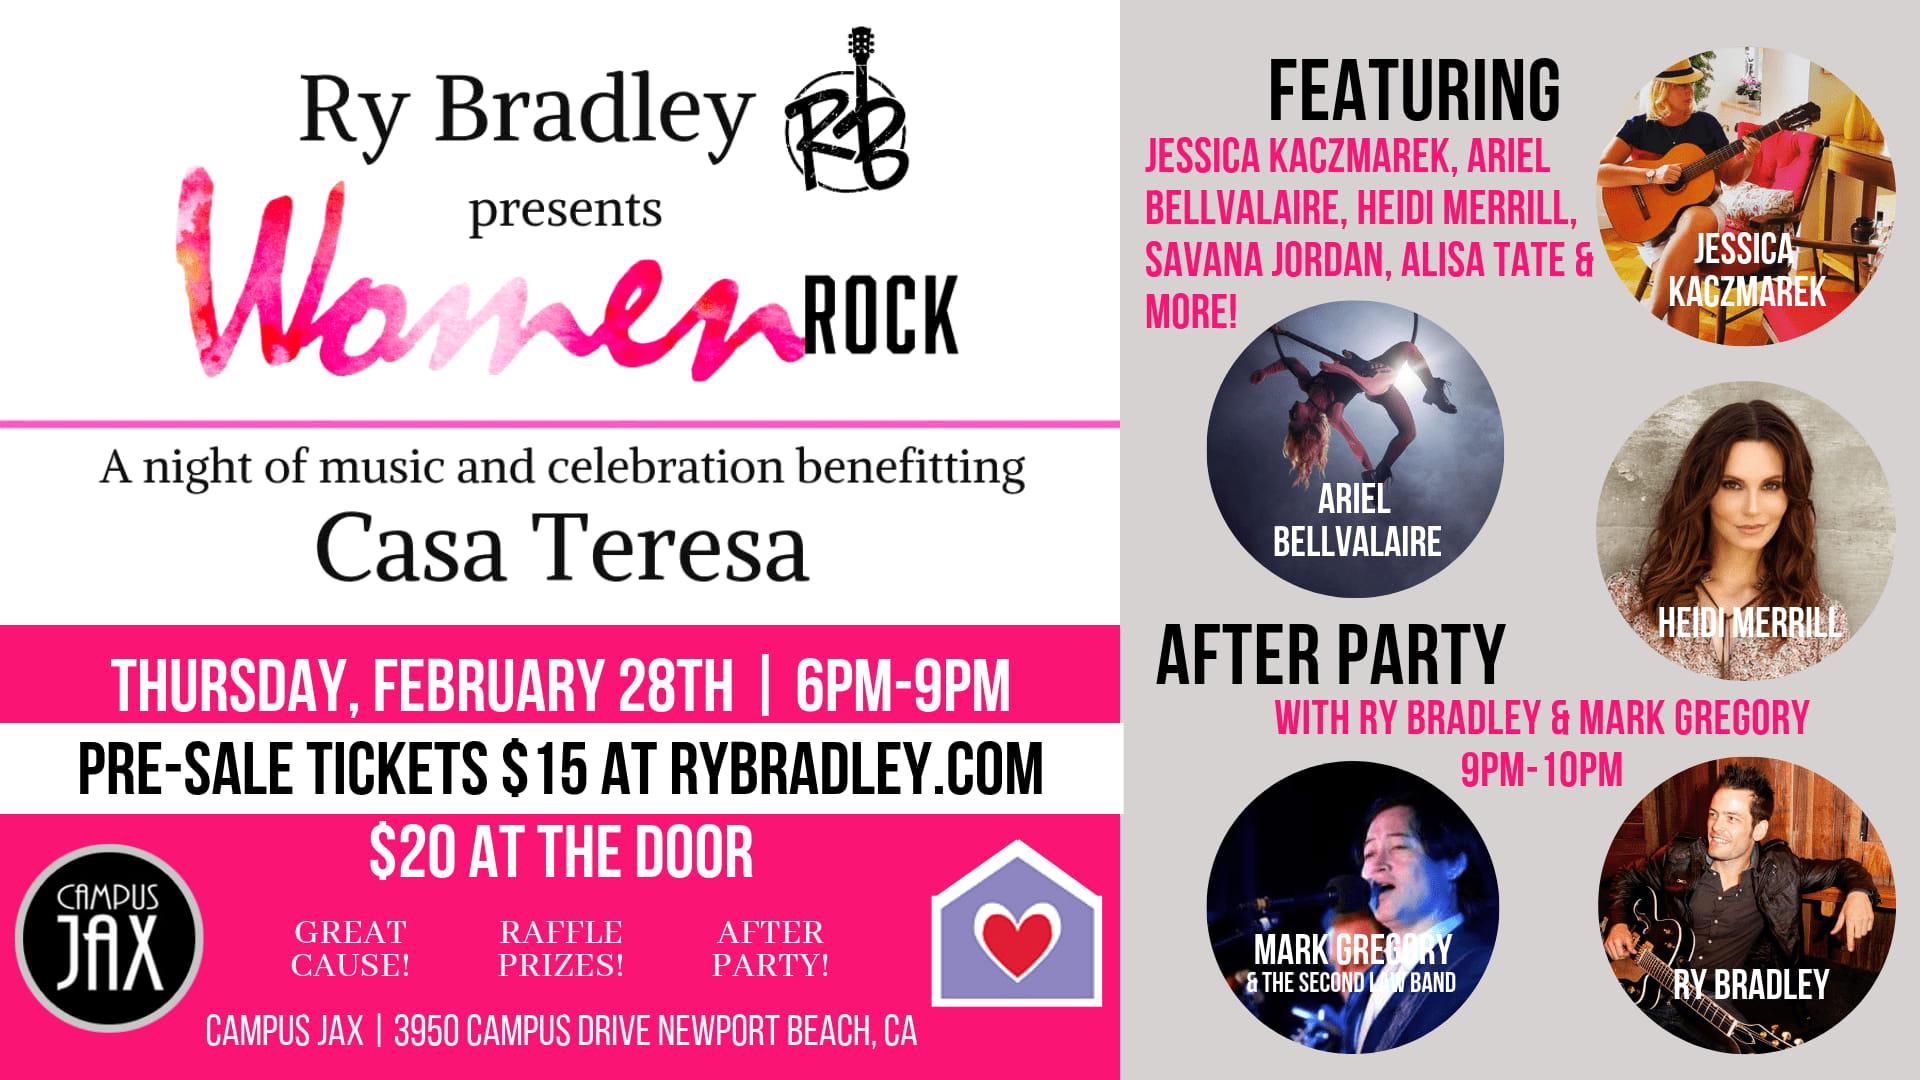 February 28 | RY BRADLEY hosts WOMEN ROCK CHARITY EVENT for Casa Teresa